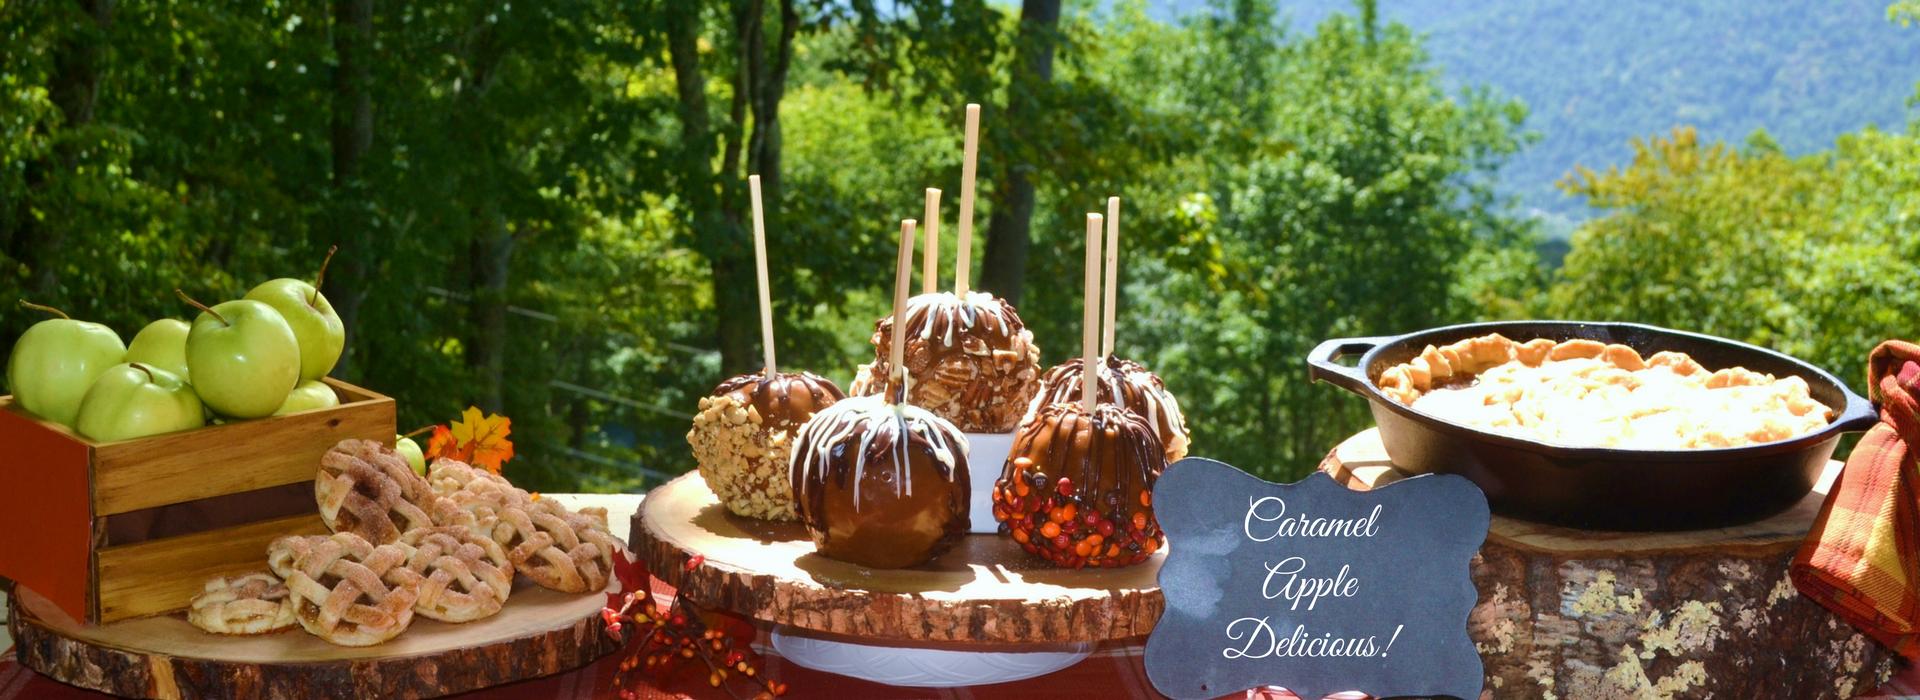 CaramelApple delicious-Slider lizbushong..com